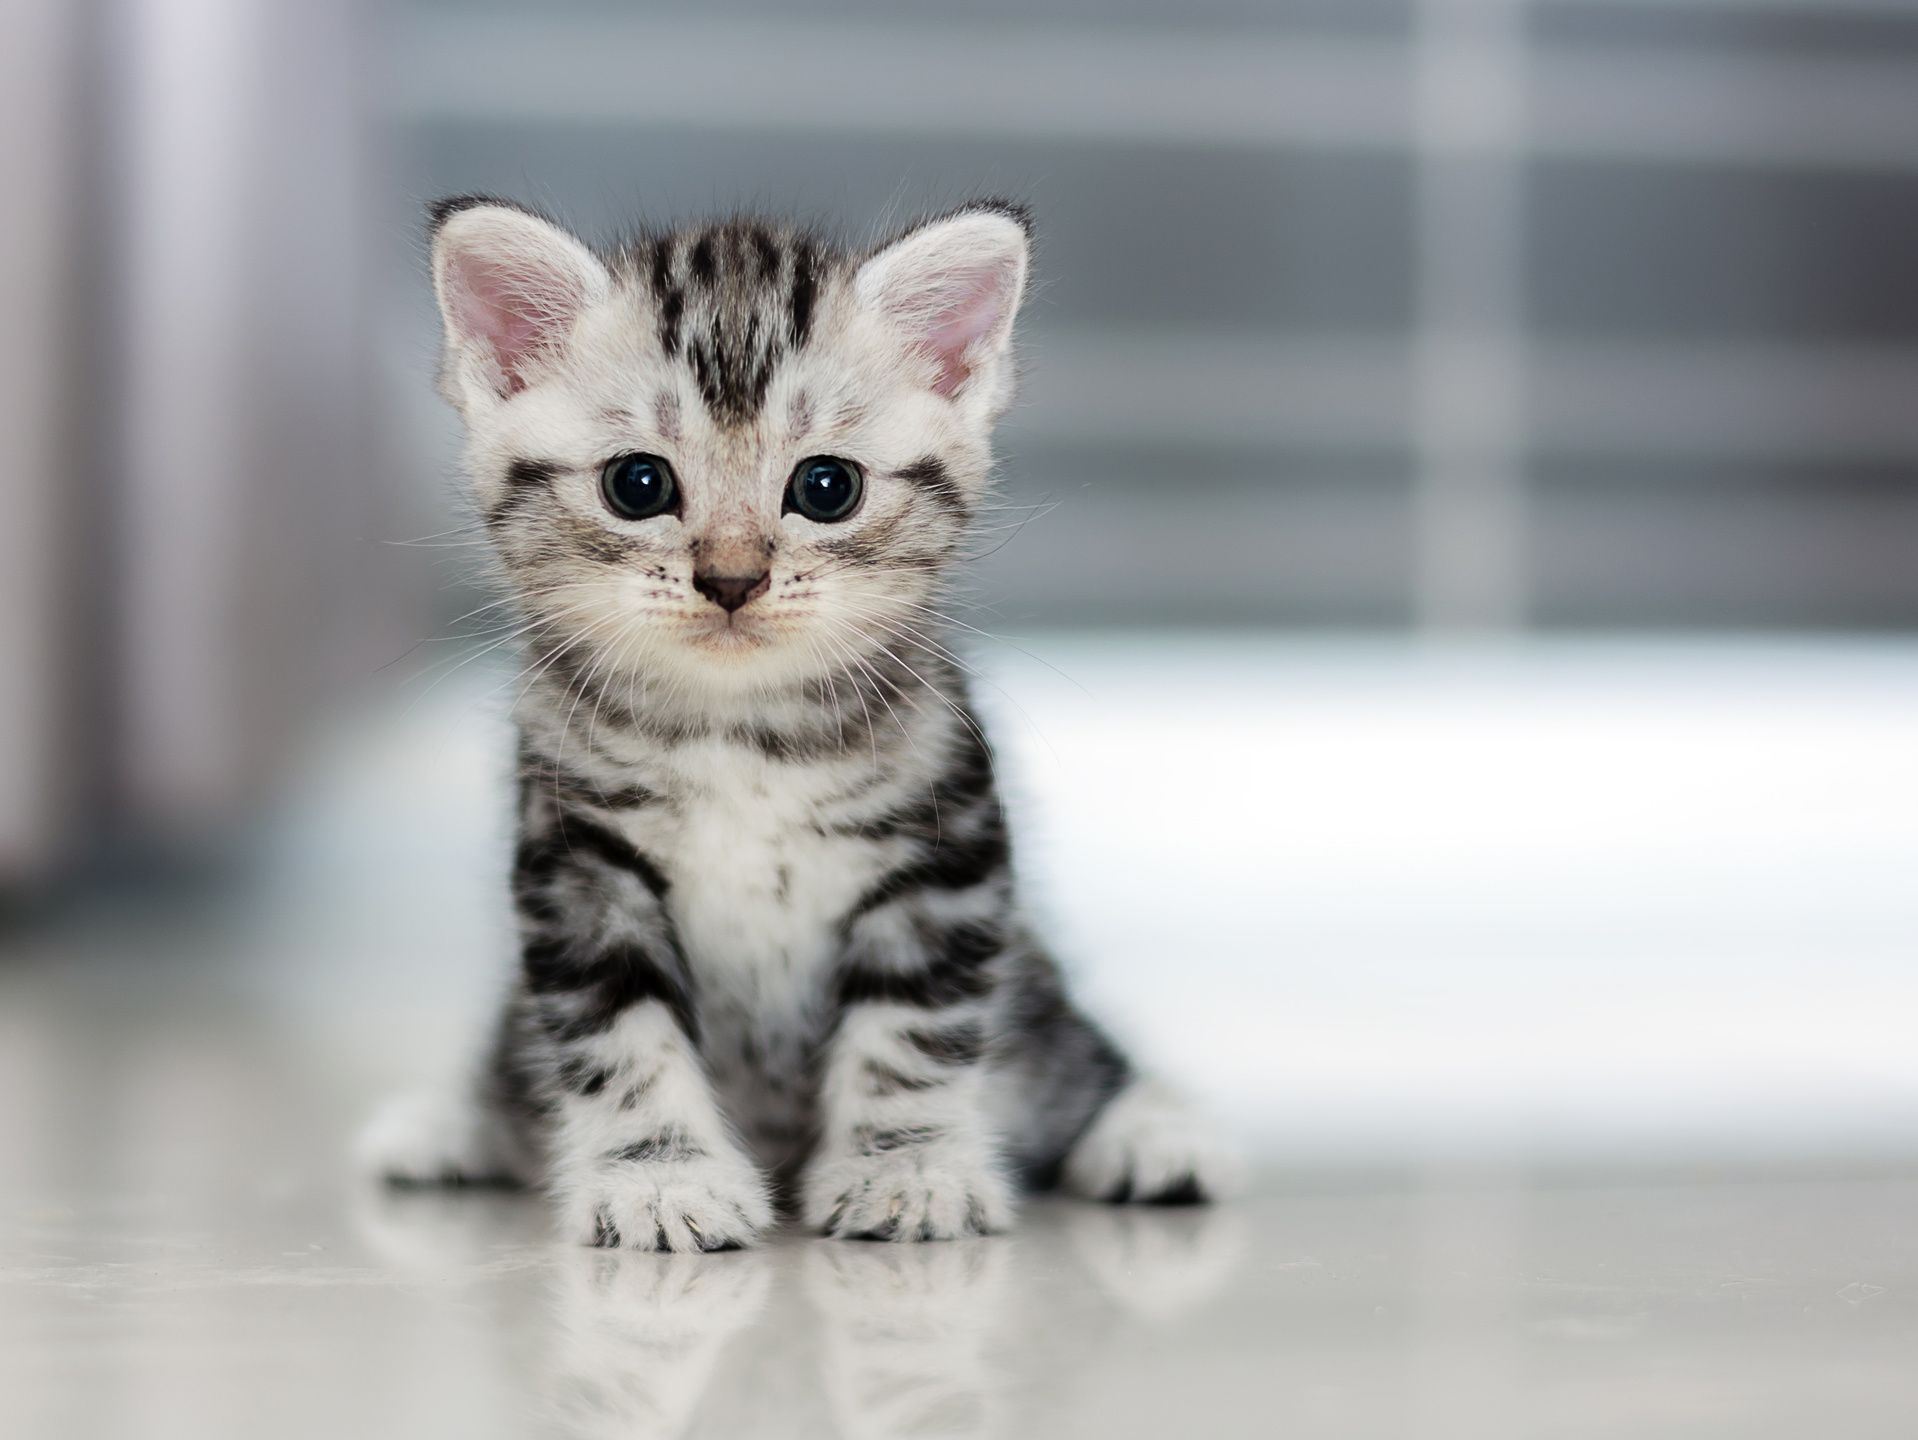 Adorable American Shorthair Kitten Portrait The American Shorthair Is A Versatile Cat That Can Be Br American Shorthair Kitten Best Cat Breeds Kittens Cutest